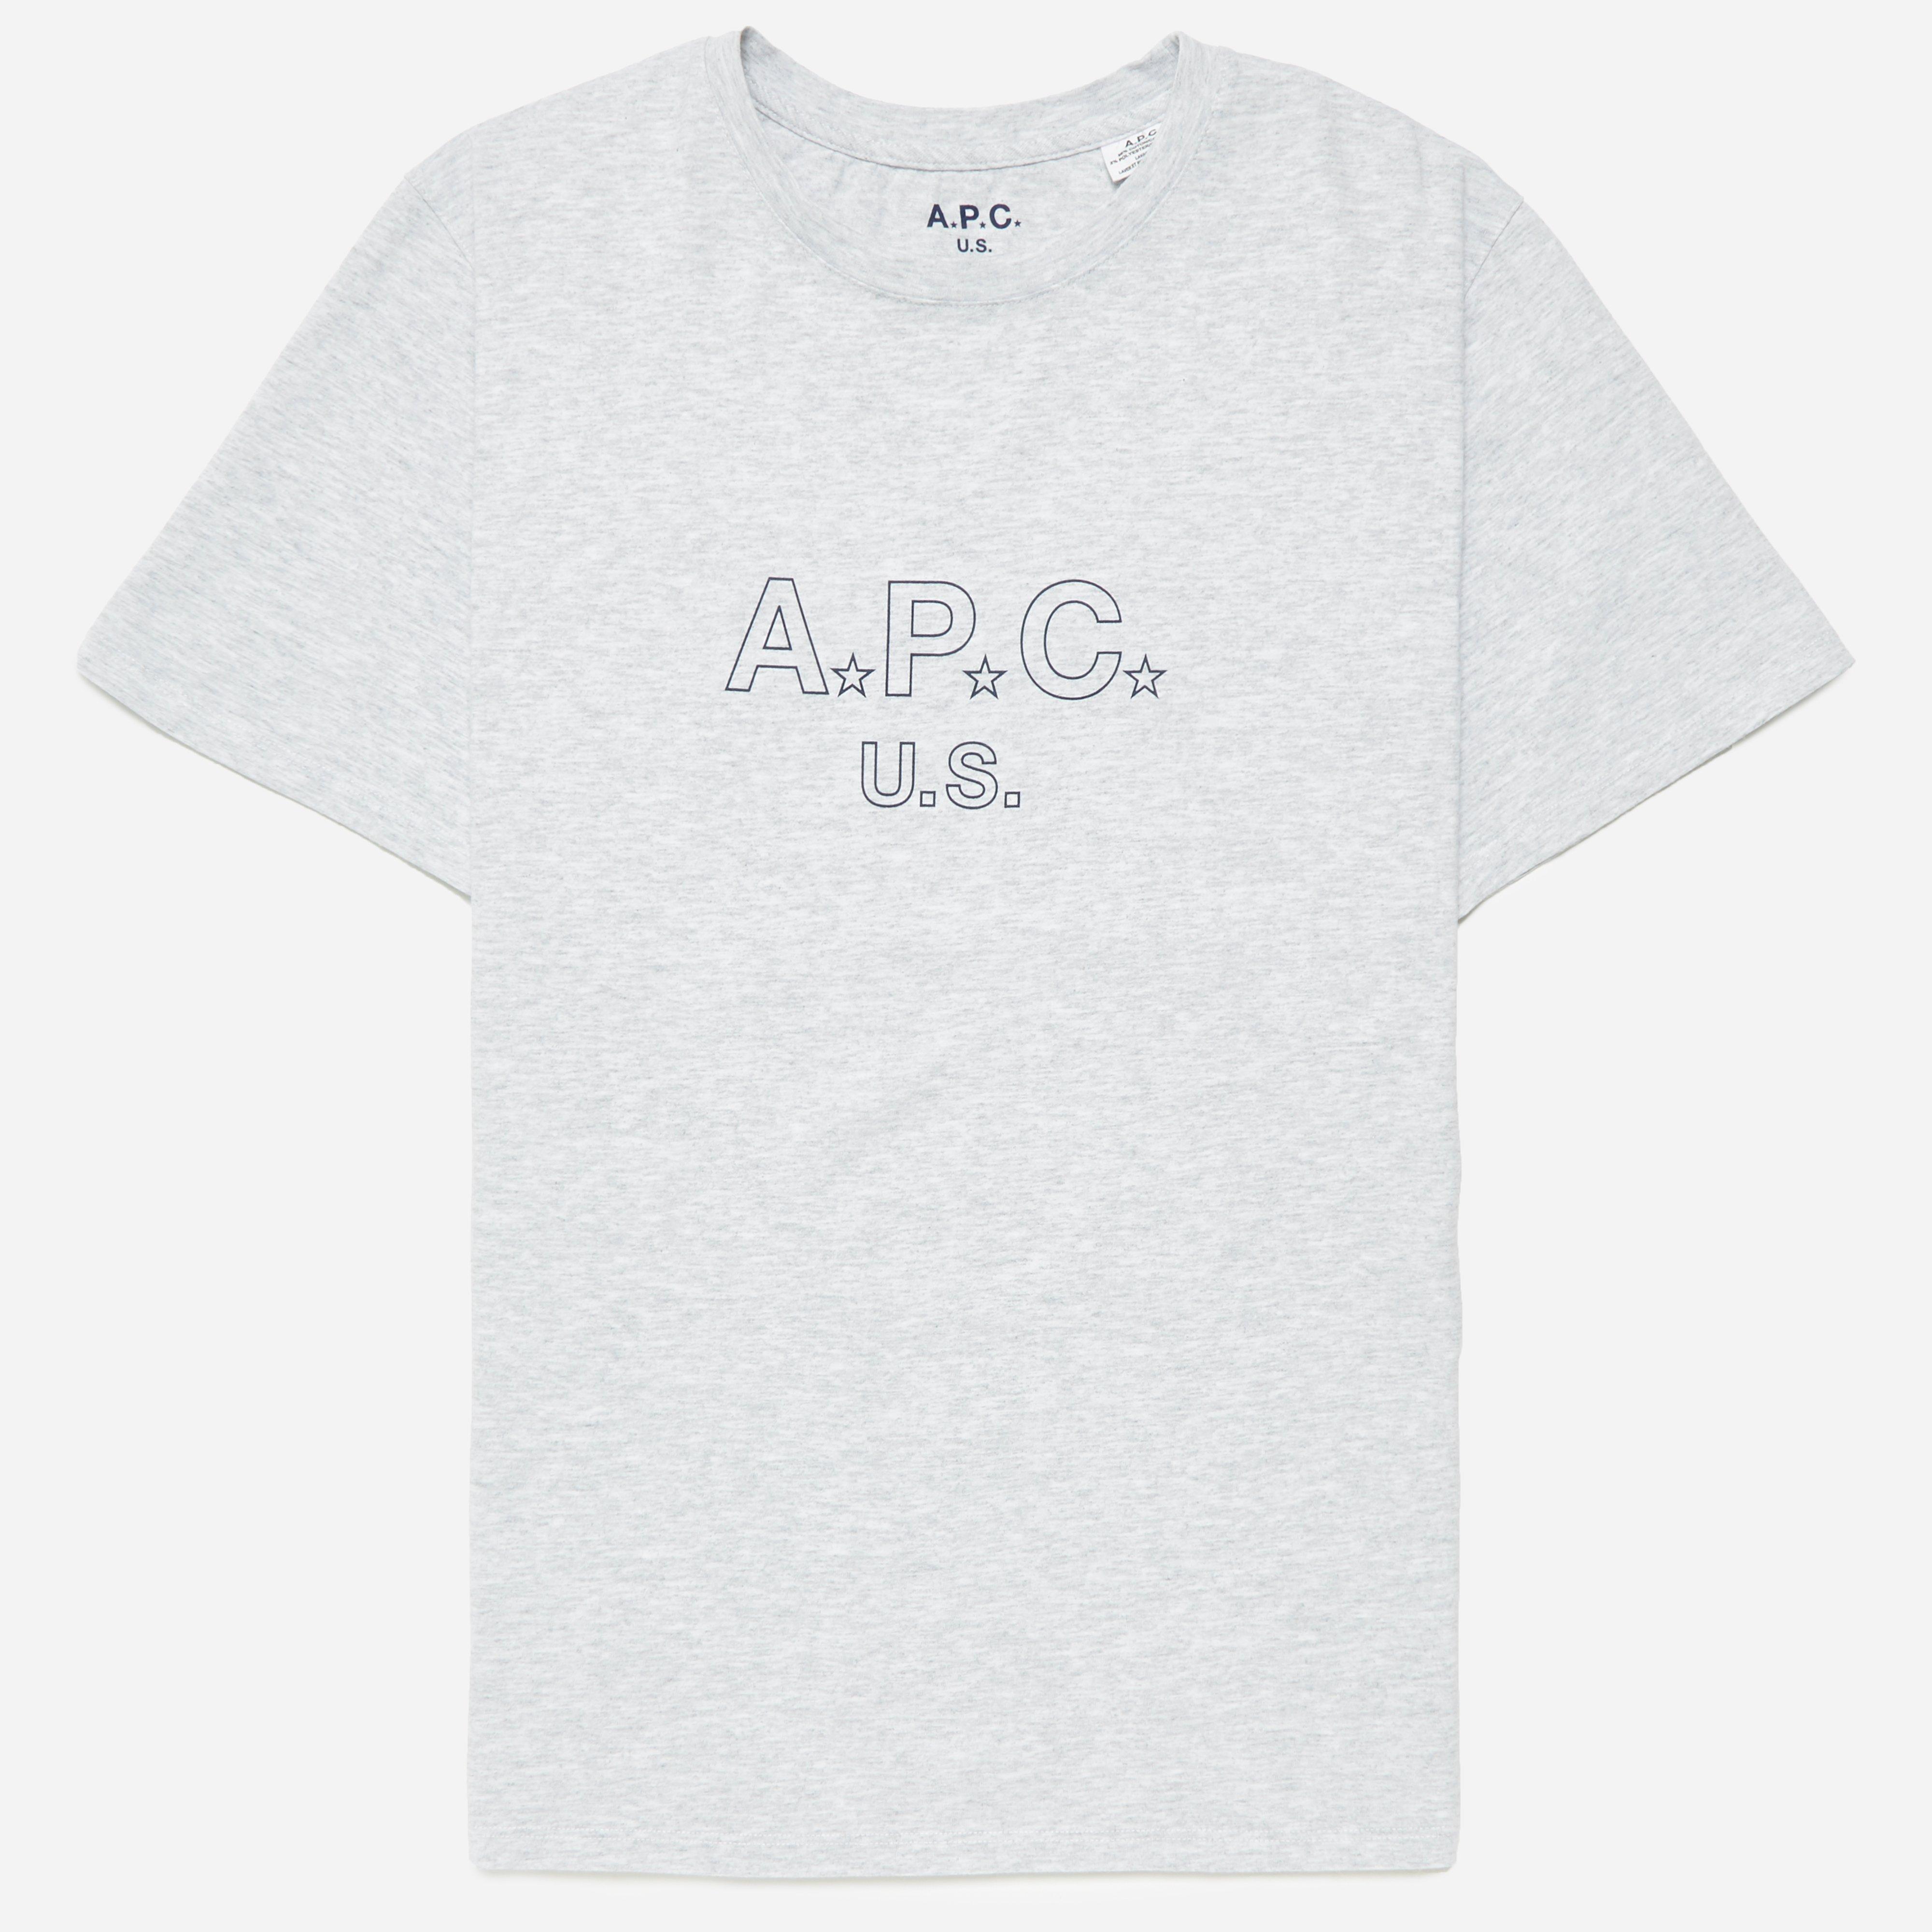 A.P.C. US Star T-shirt